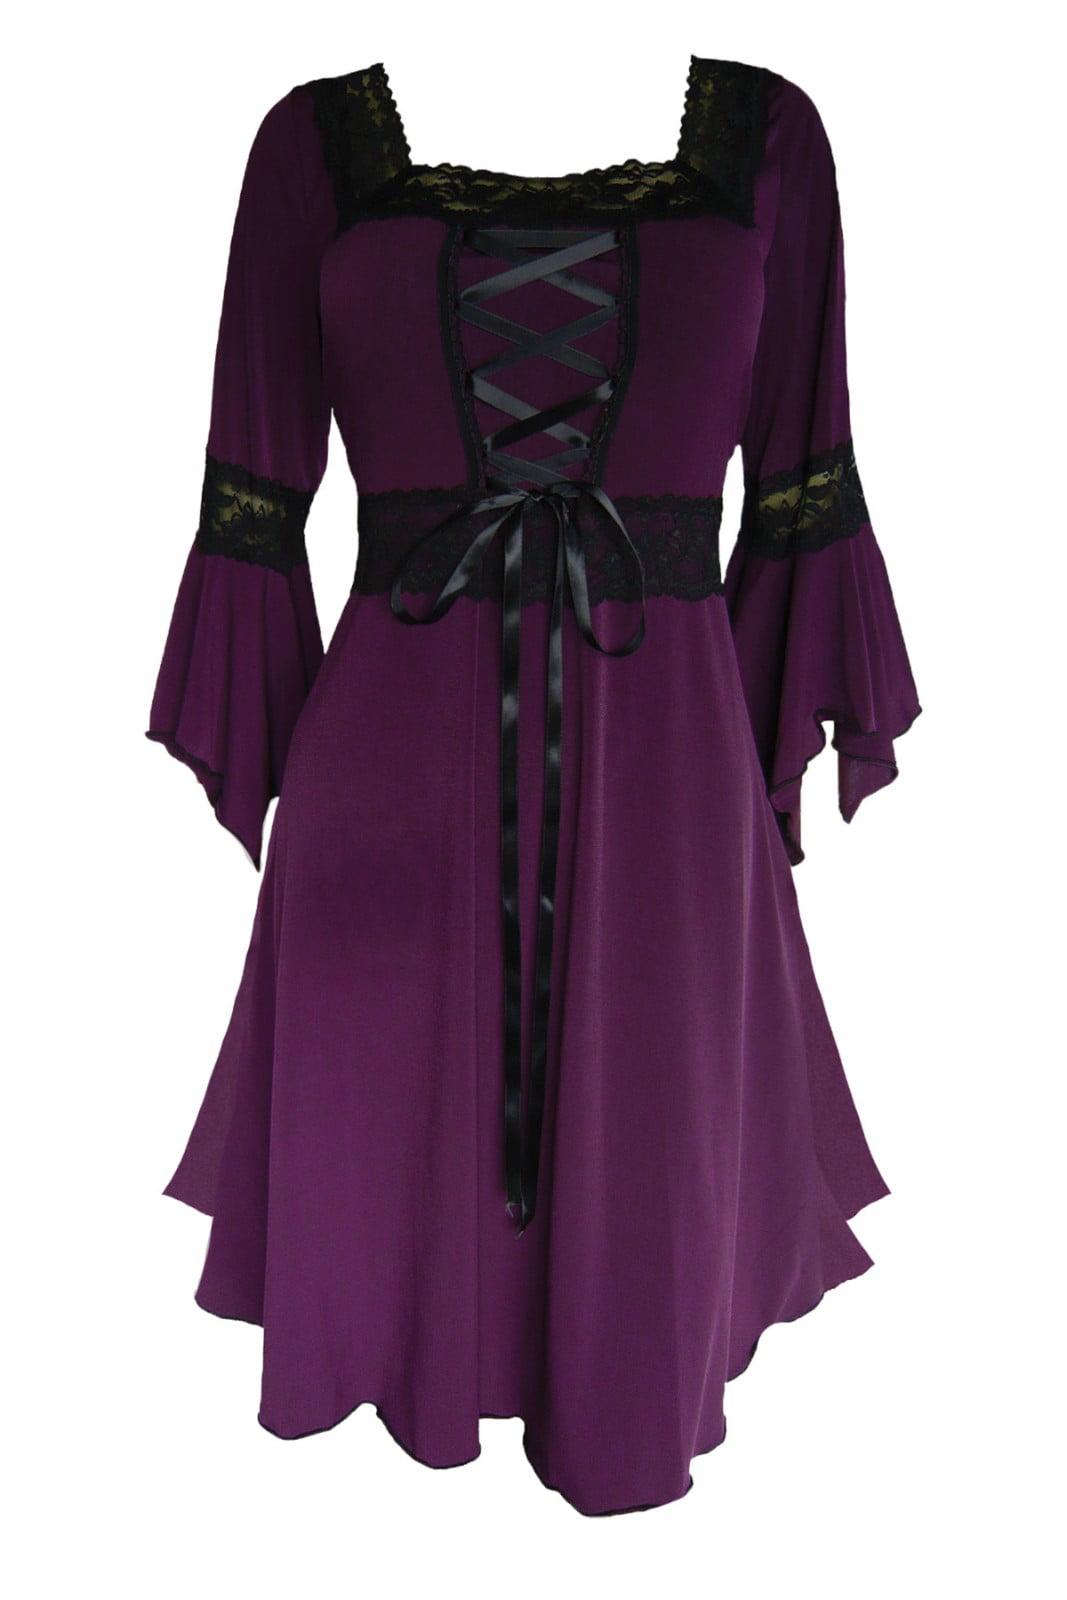 Dare To Wear Victorian Gothic Boho Women's Plus Size Renaissance Corset Dress S - 5x